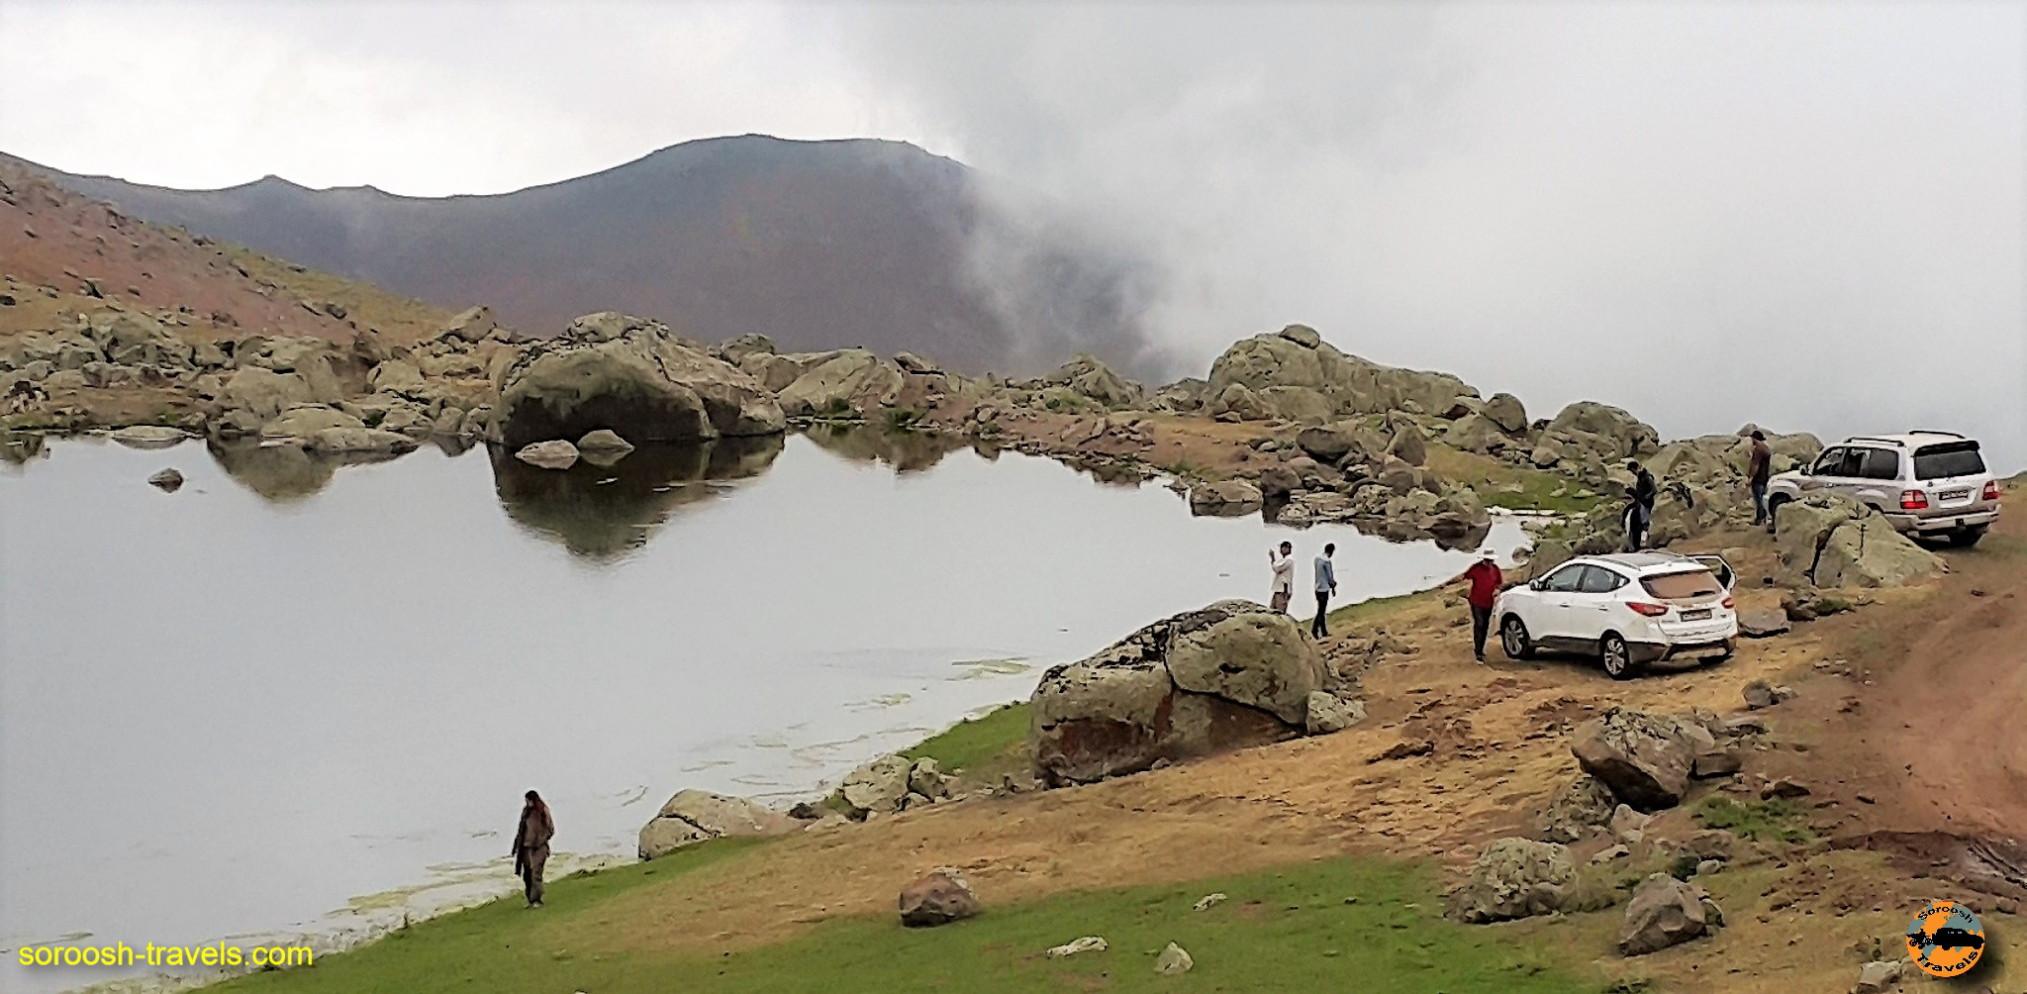 مناظر اطراف دریاچه نئور – تابستان ۱۳۹۶